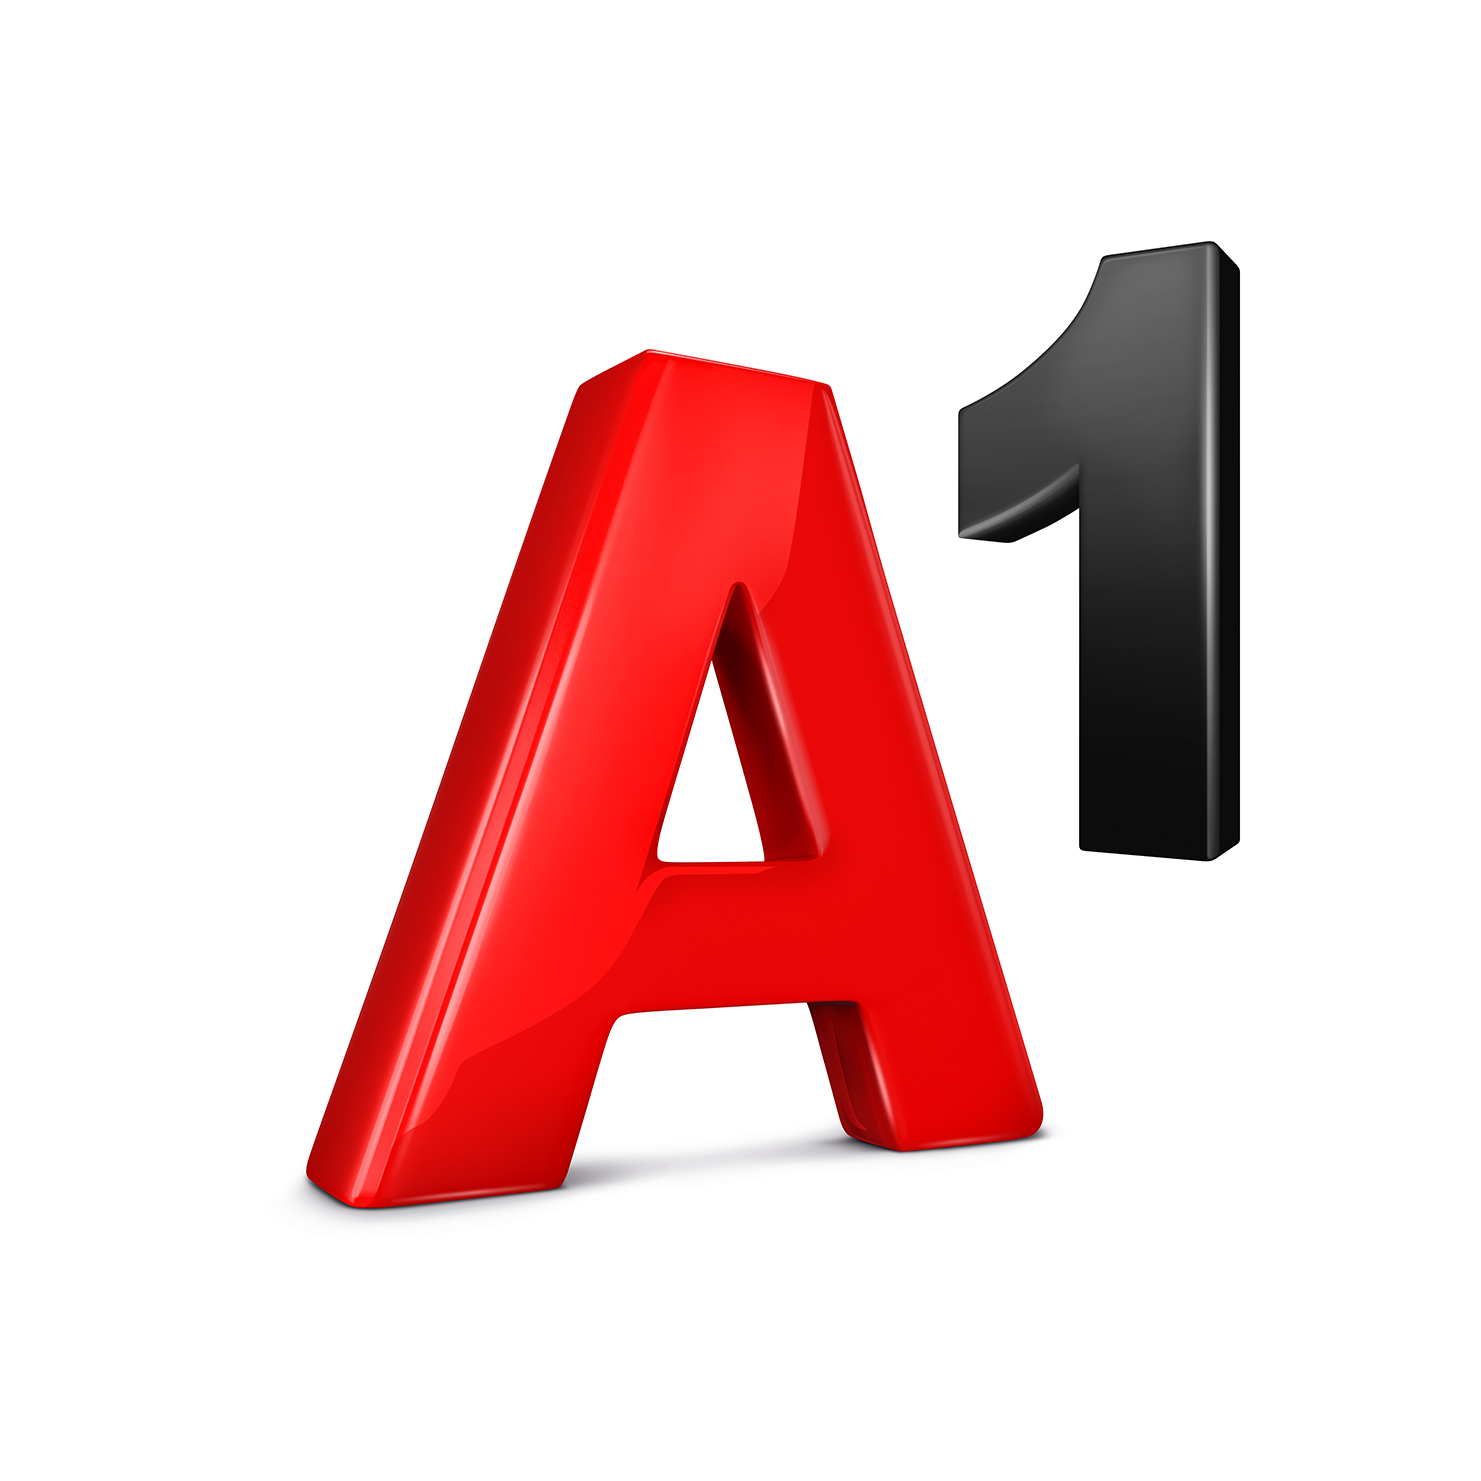 A1 Digital Campus -